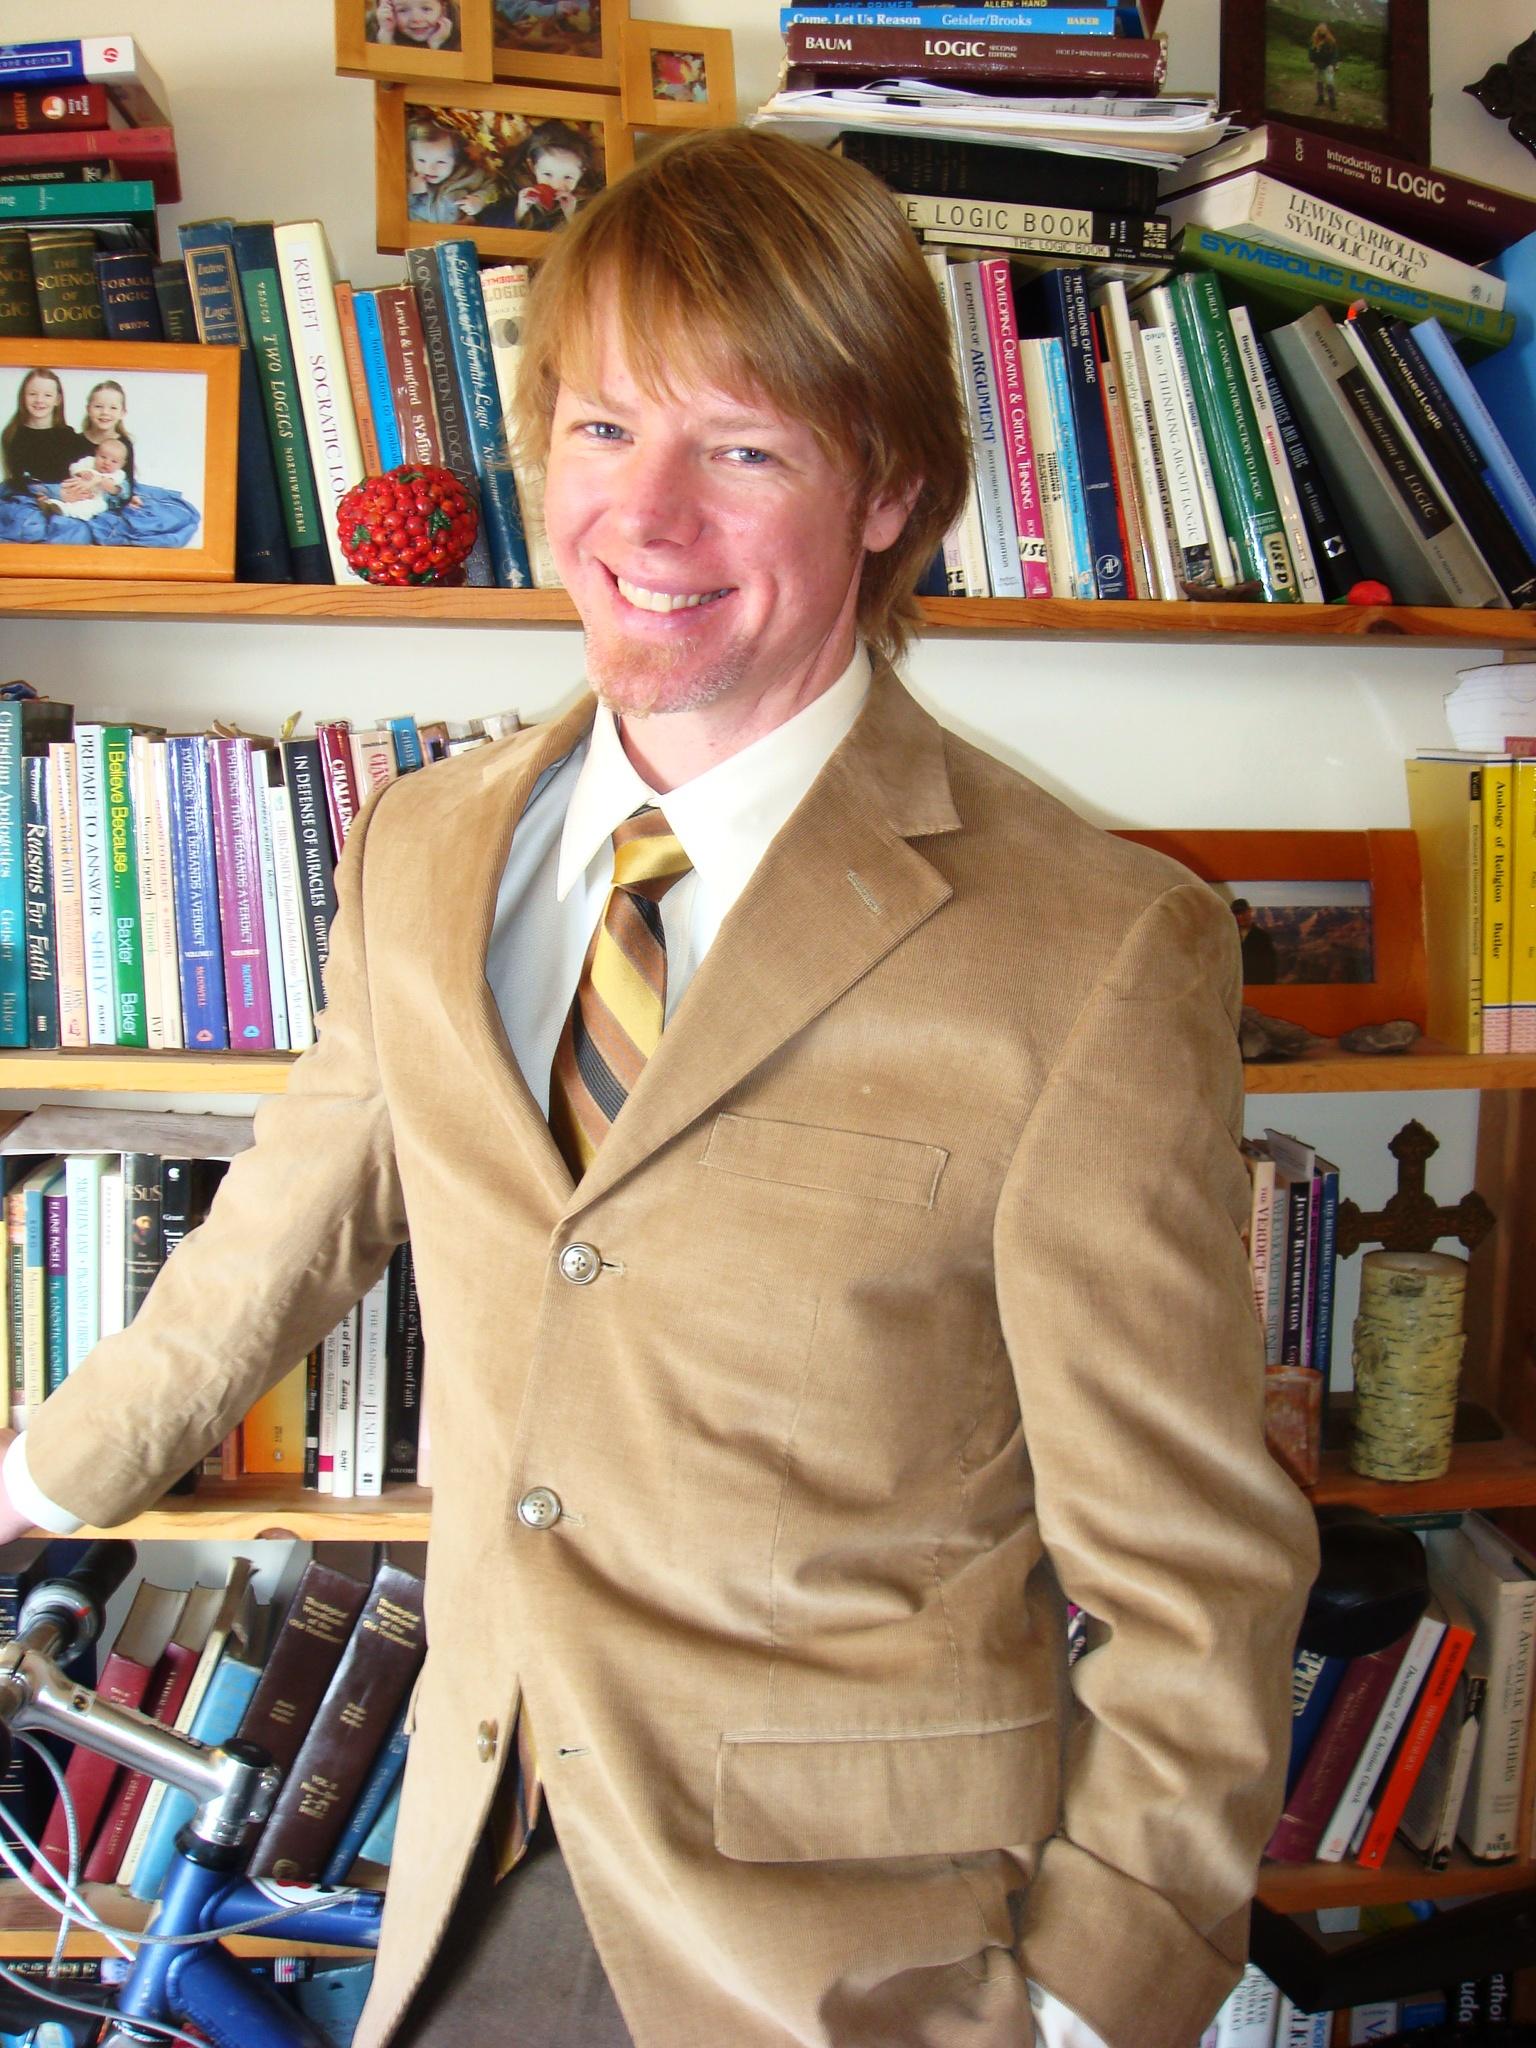 Faculty - Trent Dougherty